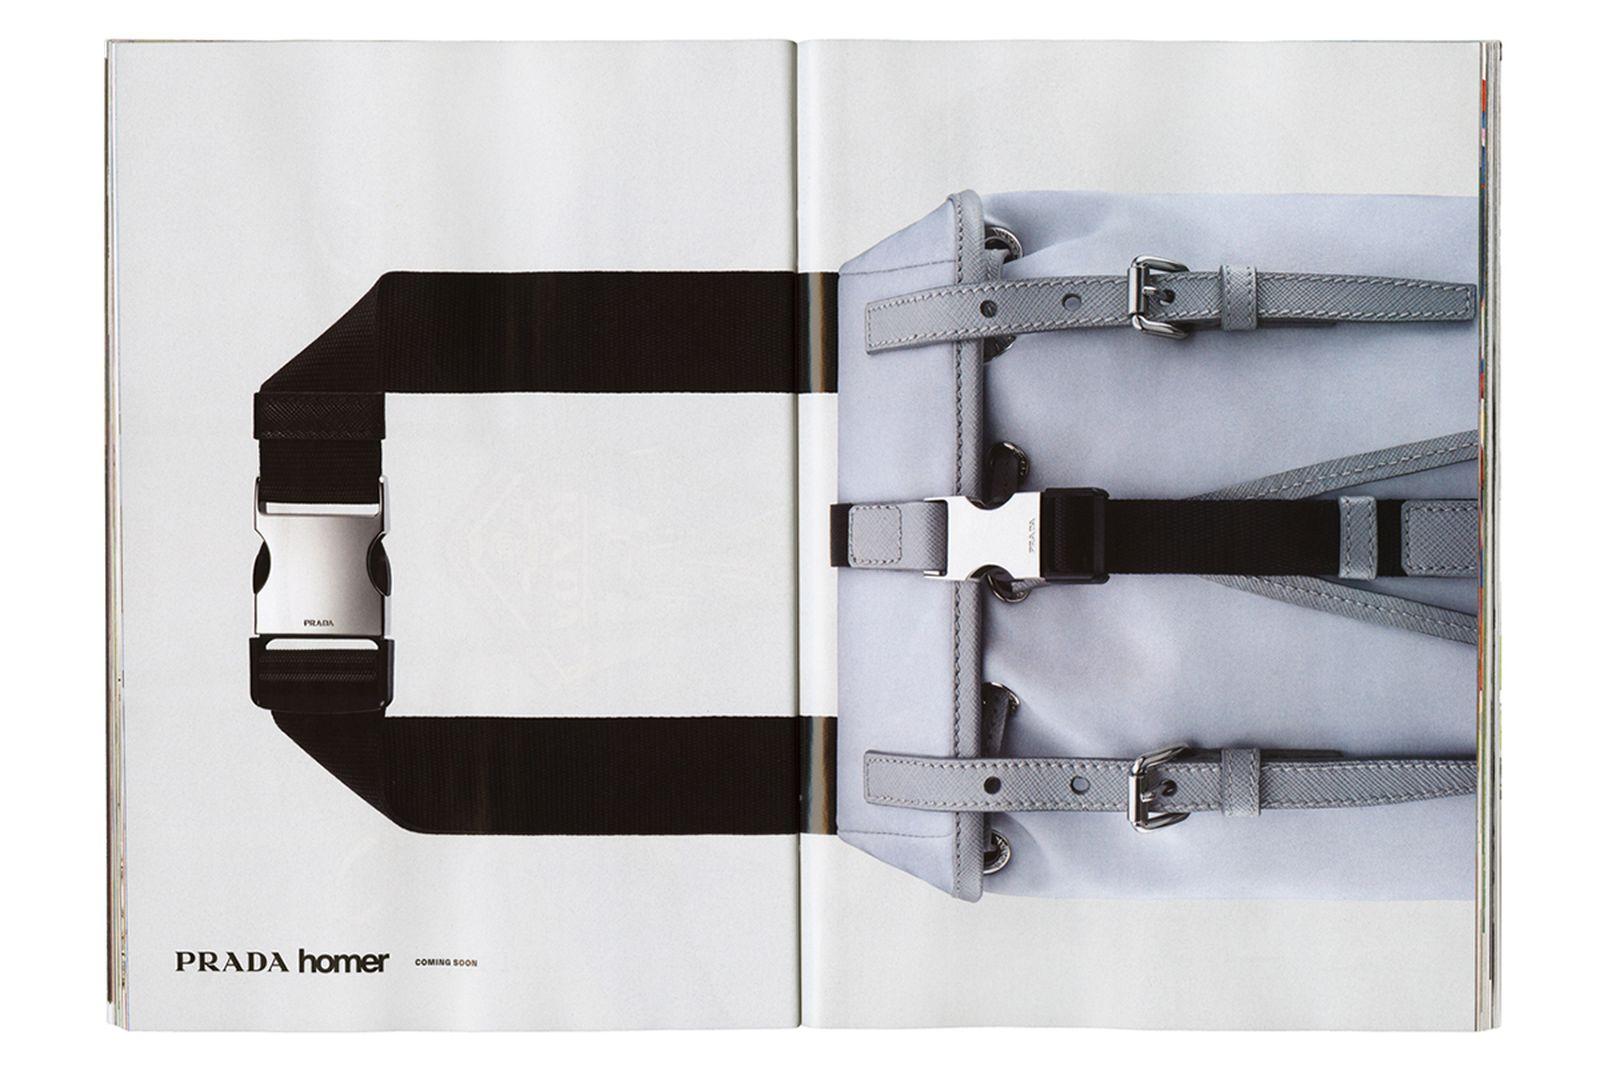 Frank Ocean Homer prada collaboration bag Brand store Catalog collection jewelry silk scarves